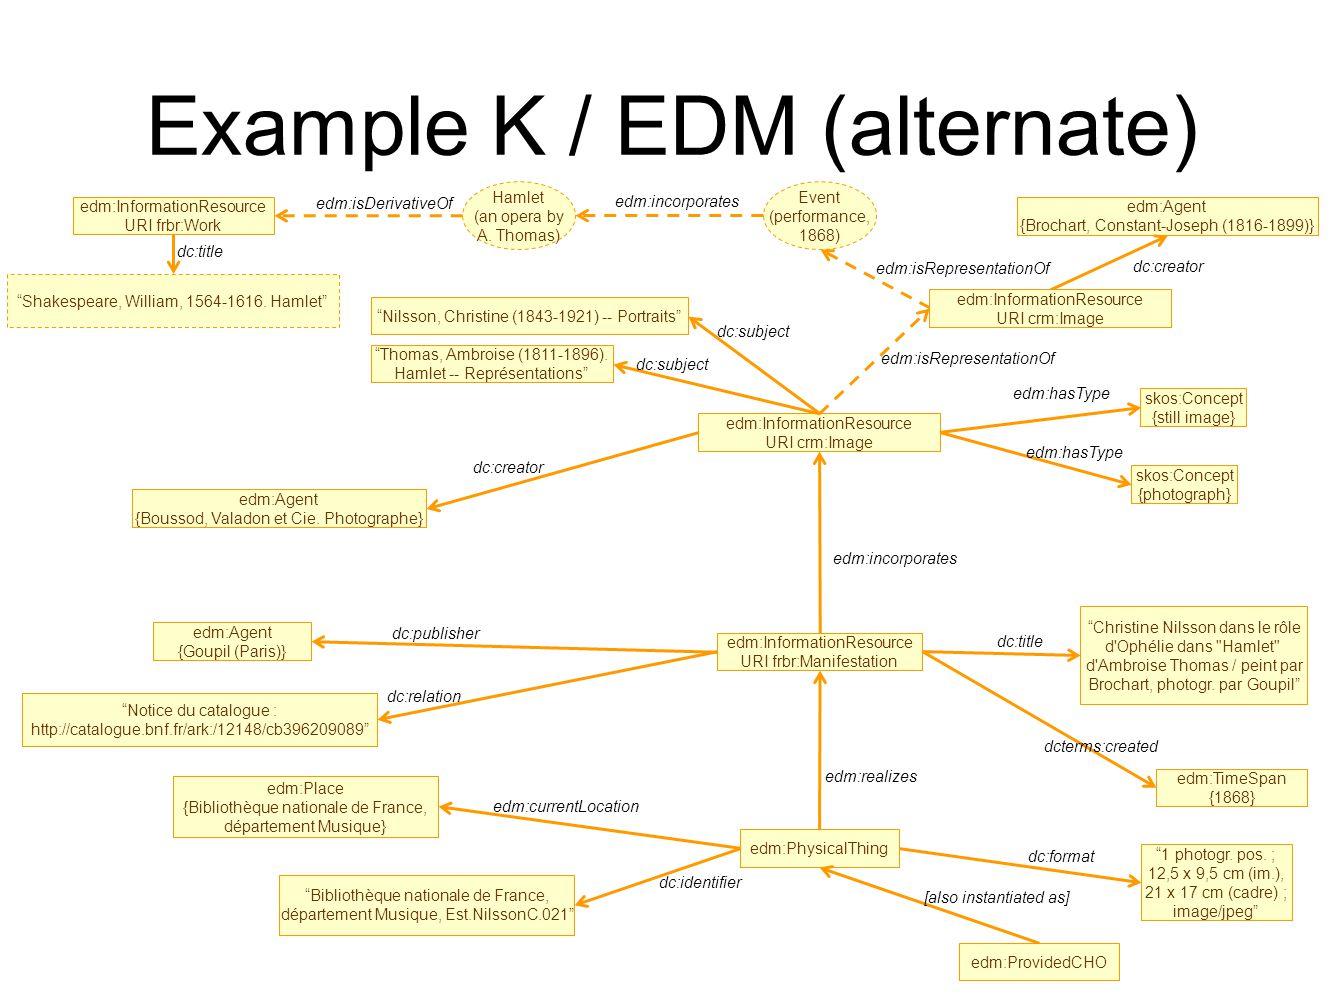 Example K / EDM (alternate) edm:InformationResource URI crm:Image edm:Agent {Boussod, Valadon et Cie.